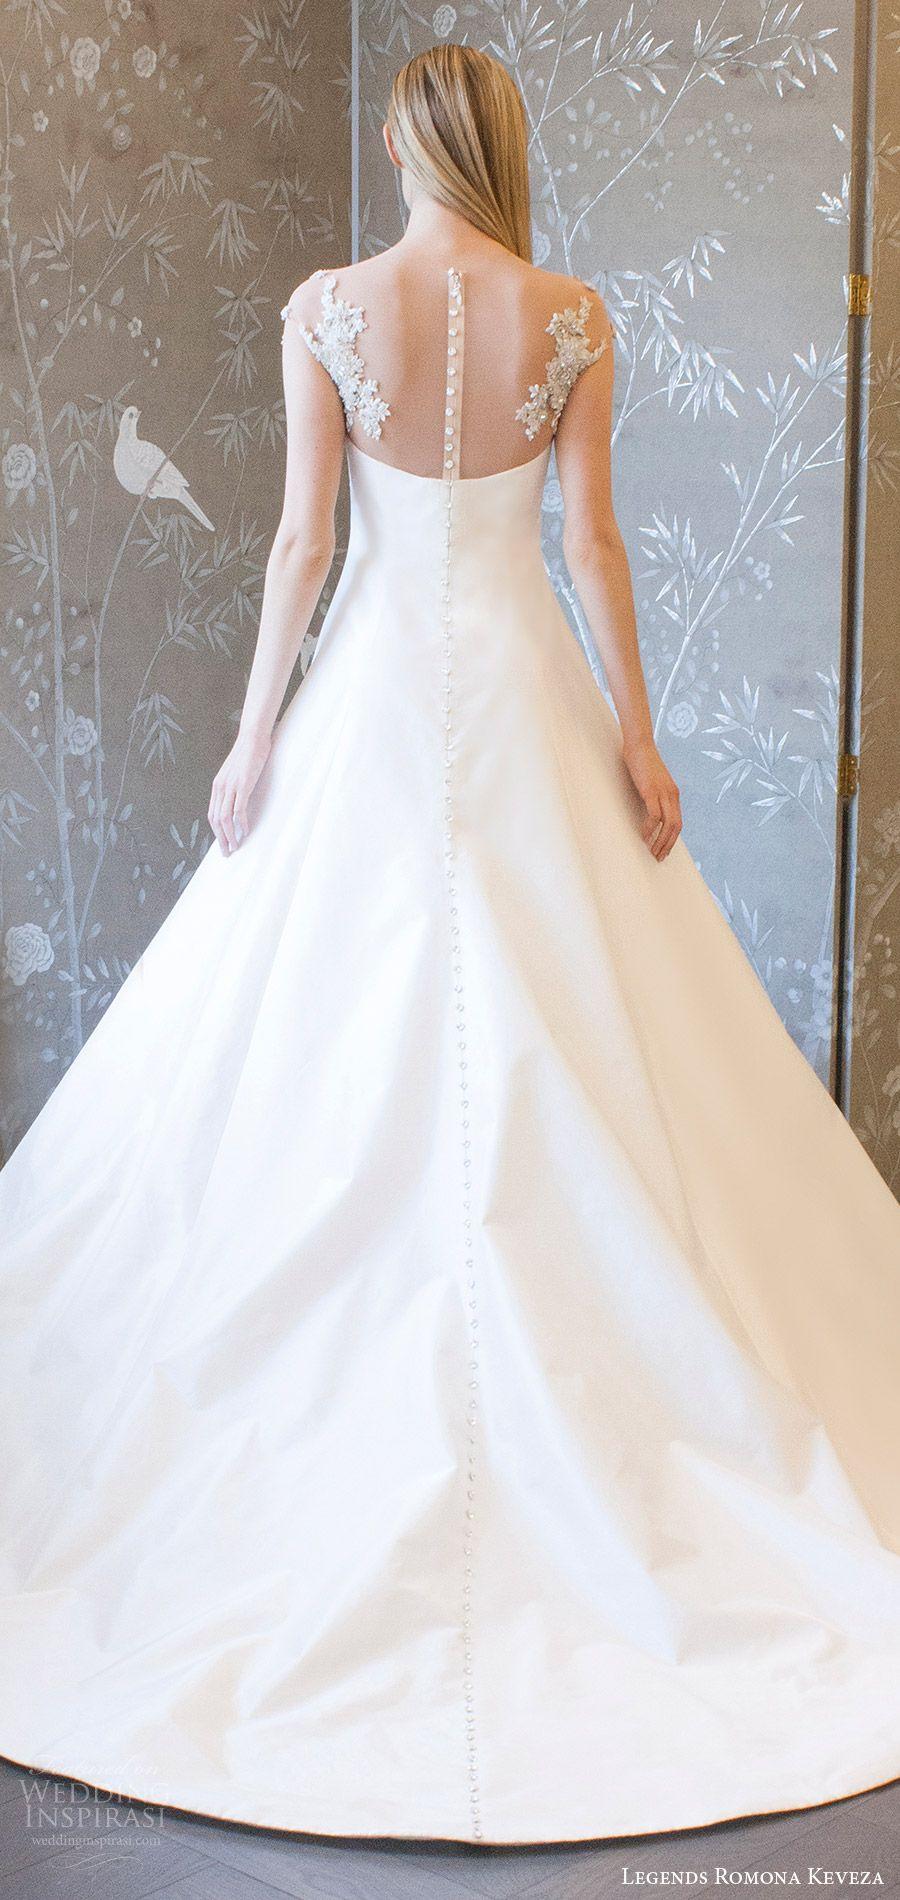 Legends romona keveza spring wedding dresses wedding dress